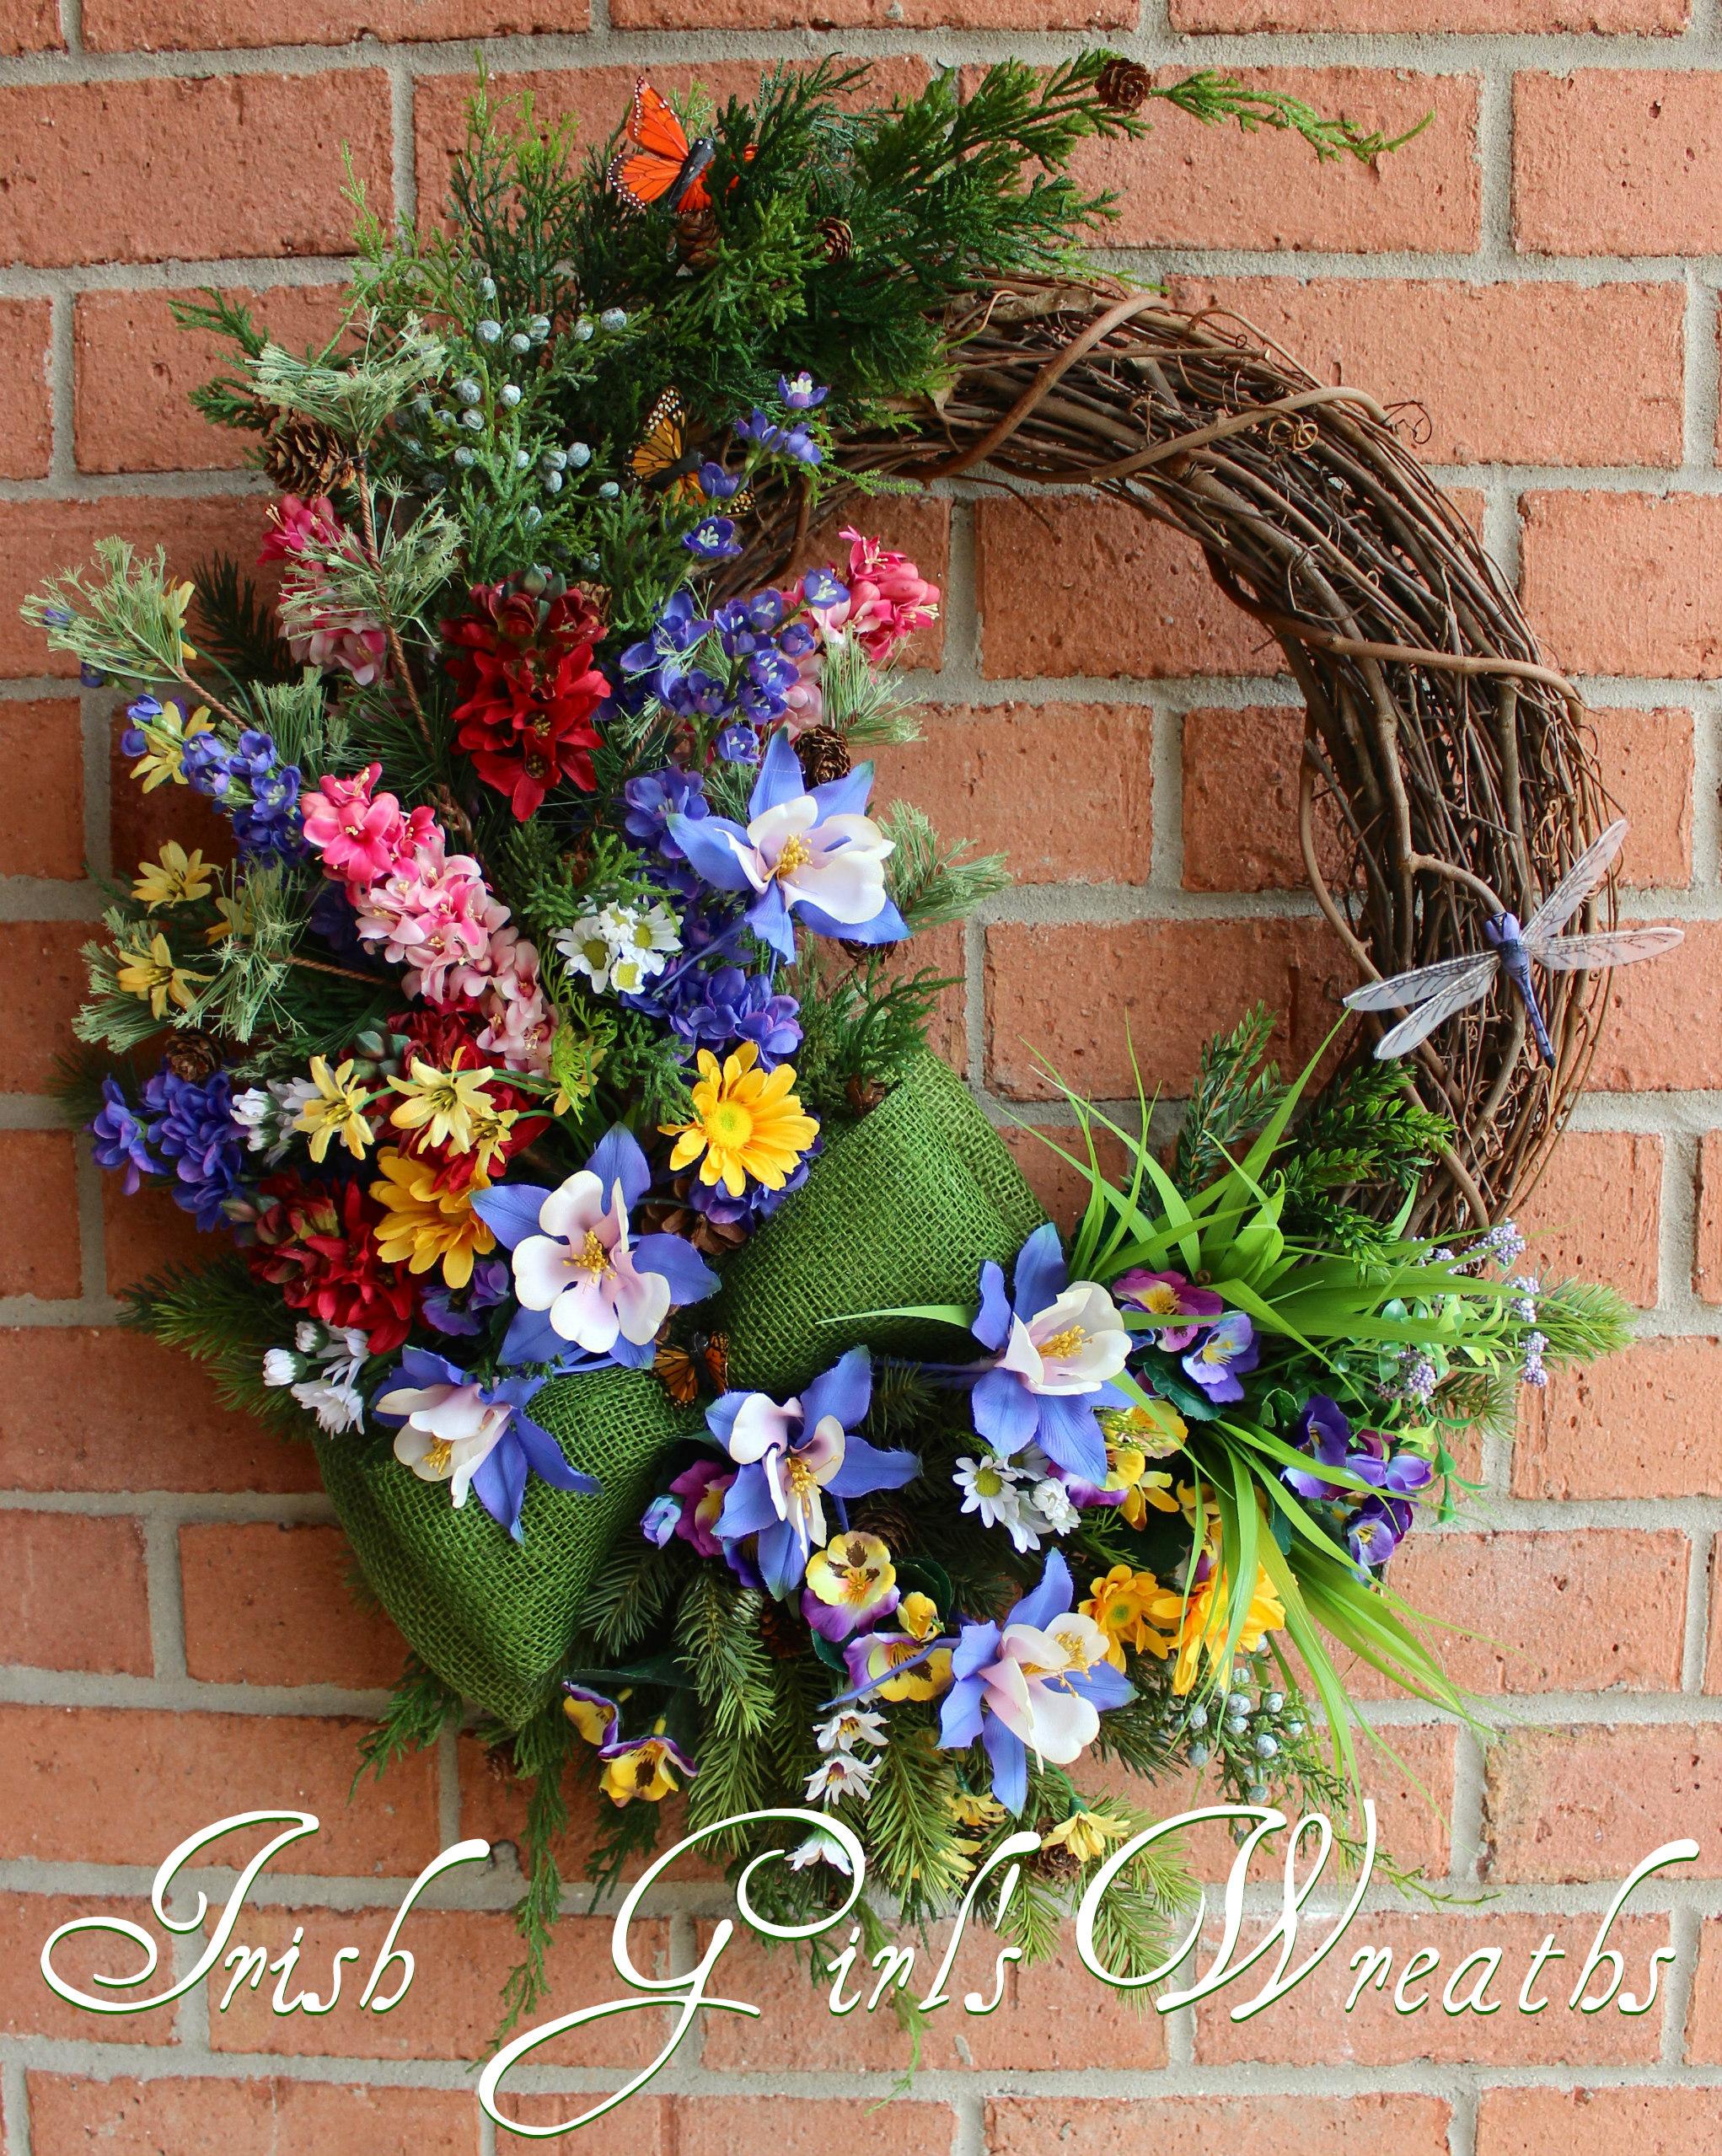 Colorado Mountain Wildflower – Pacific Northwest Majestic Wilderness Wreath